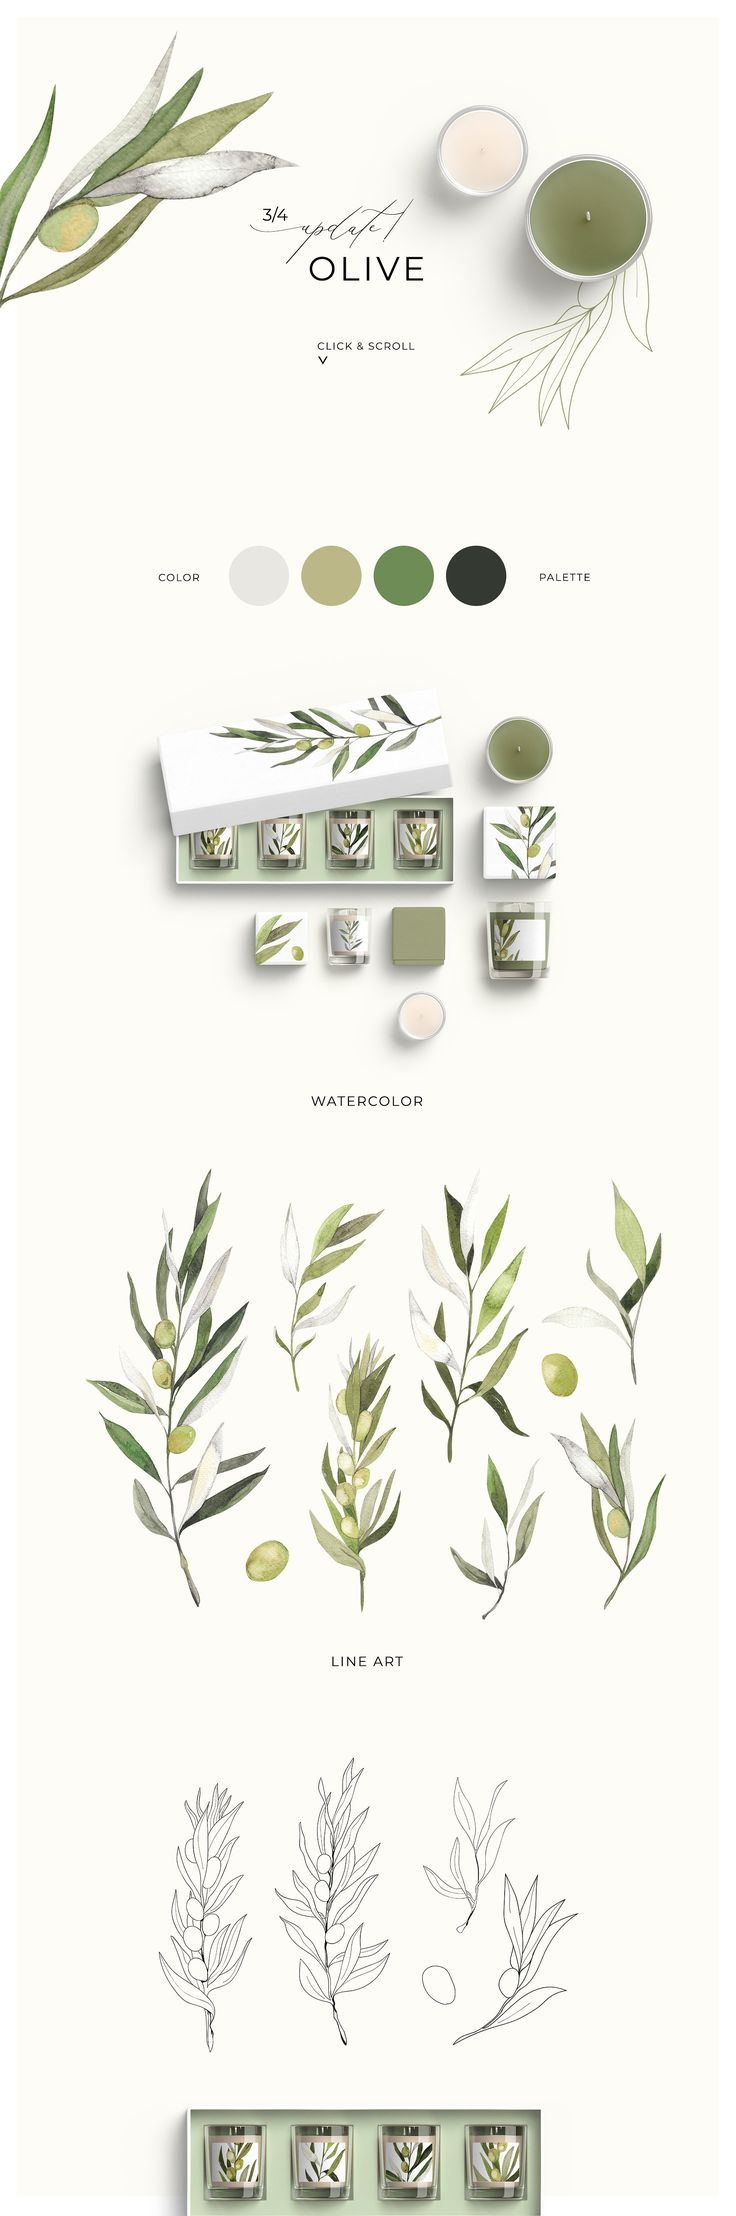 -30% TRENDY GREENERY +UPD  by Lana Elanor on Creative Market – Lana Elanor